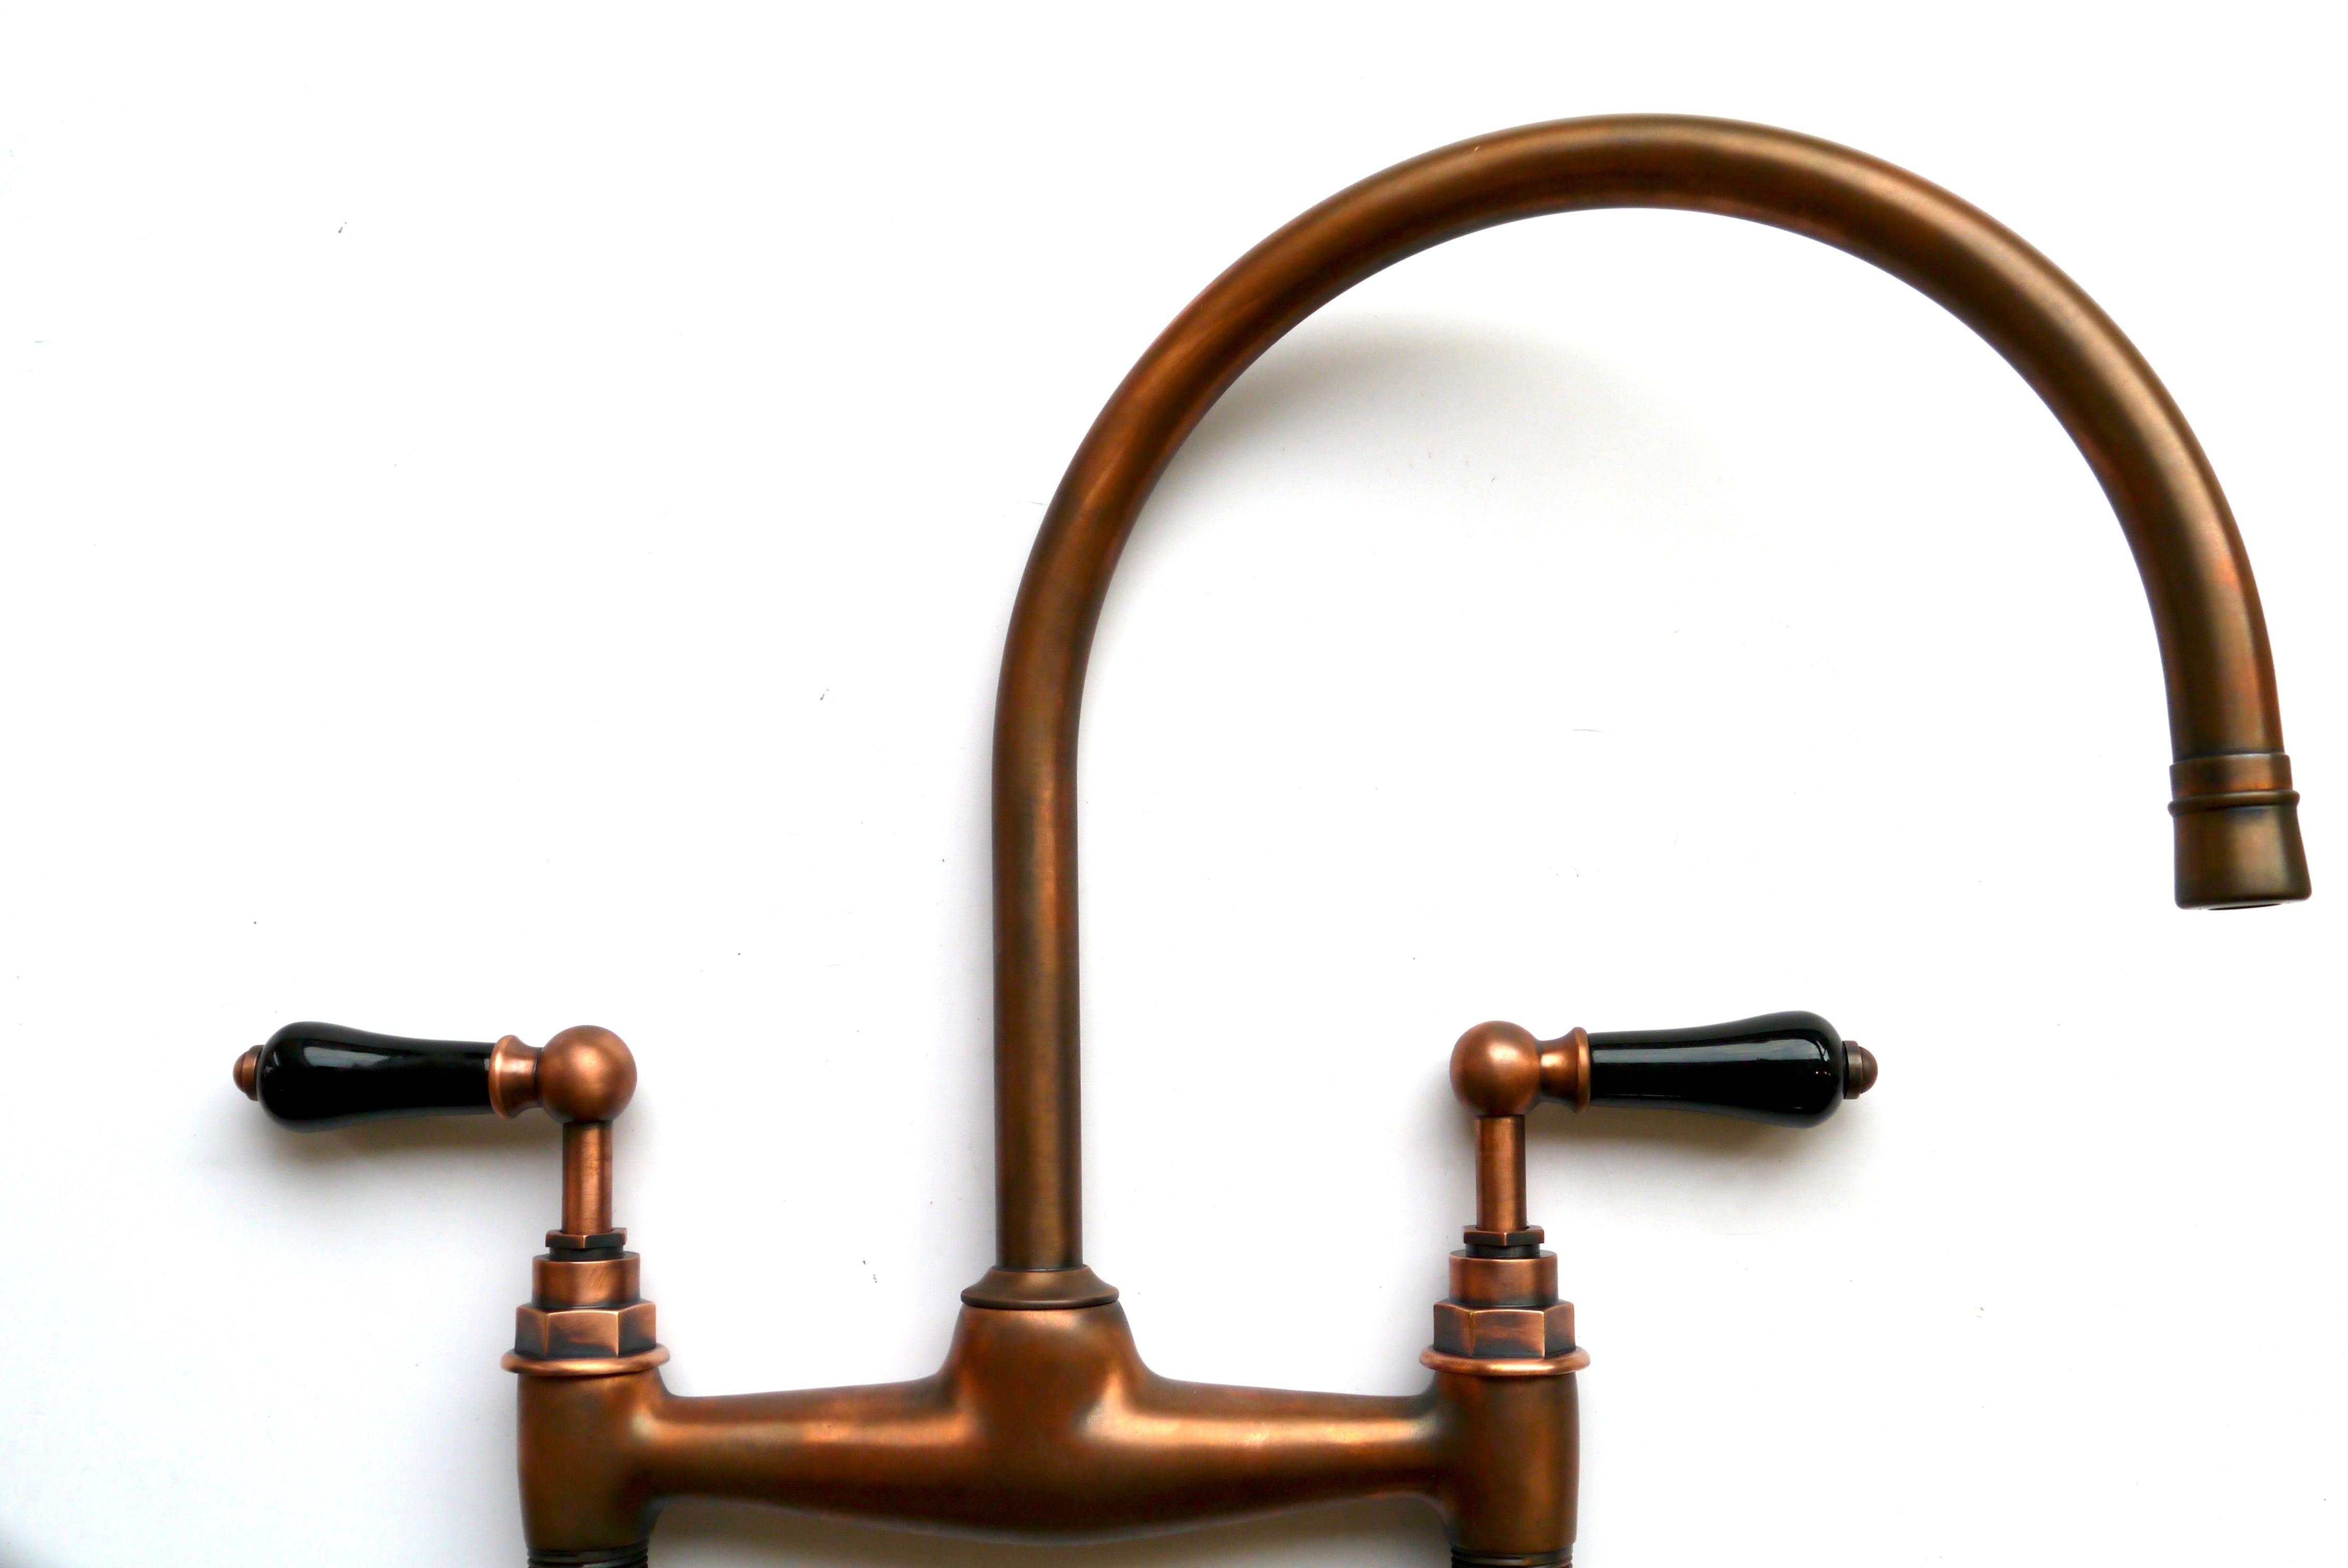 copper kitchen tap mixer